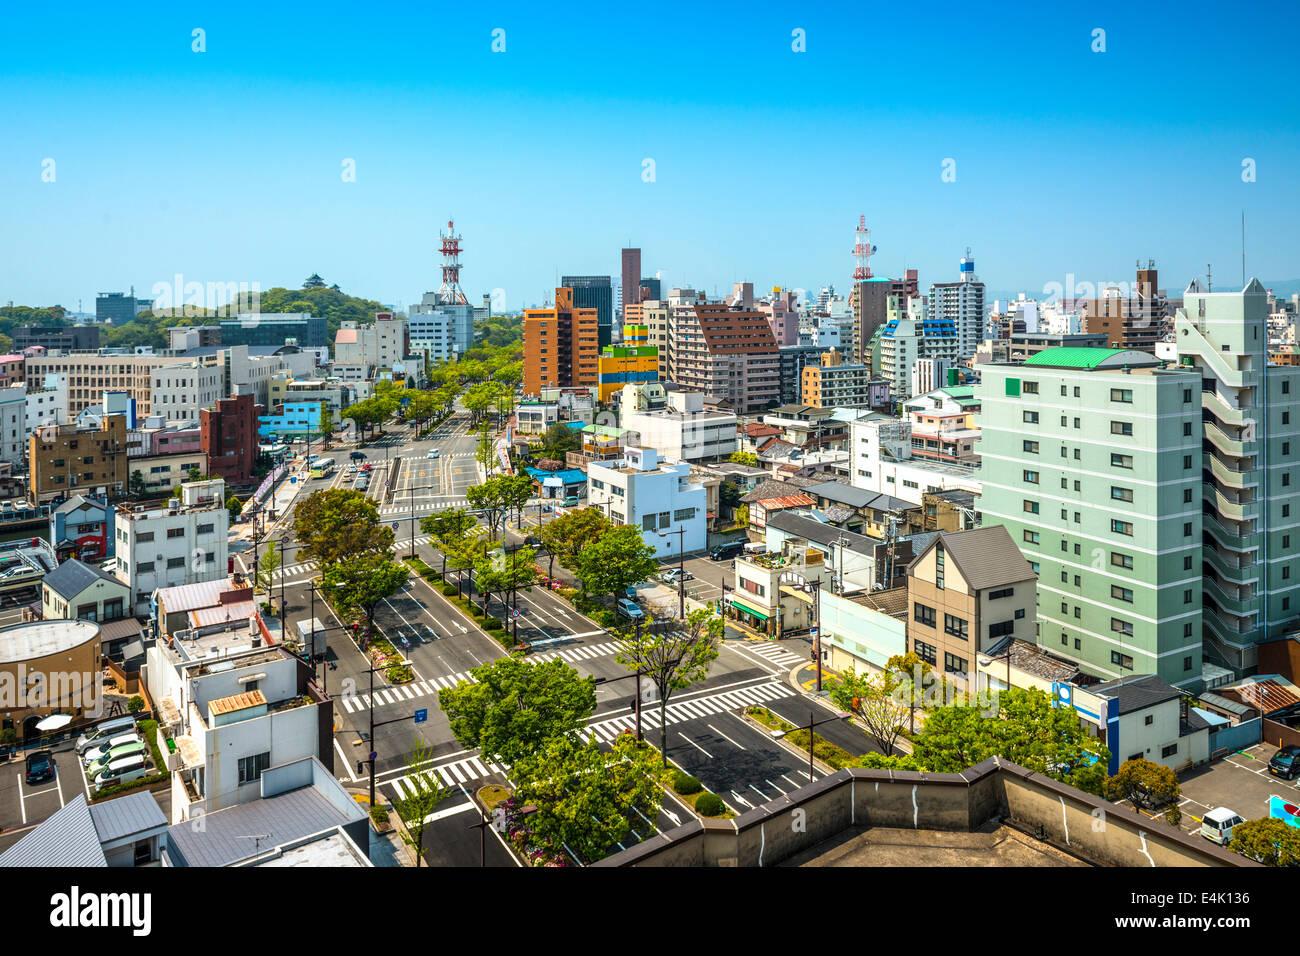 Wakayama City, Wakayama, Japan cityscape. - Stock Image